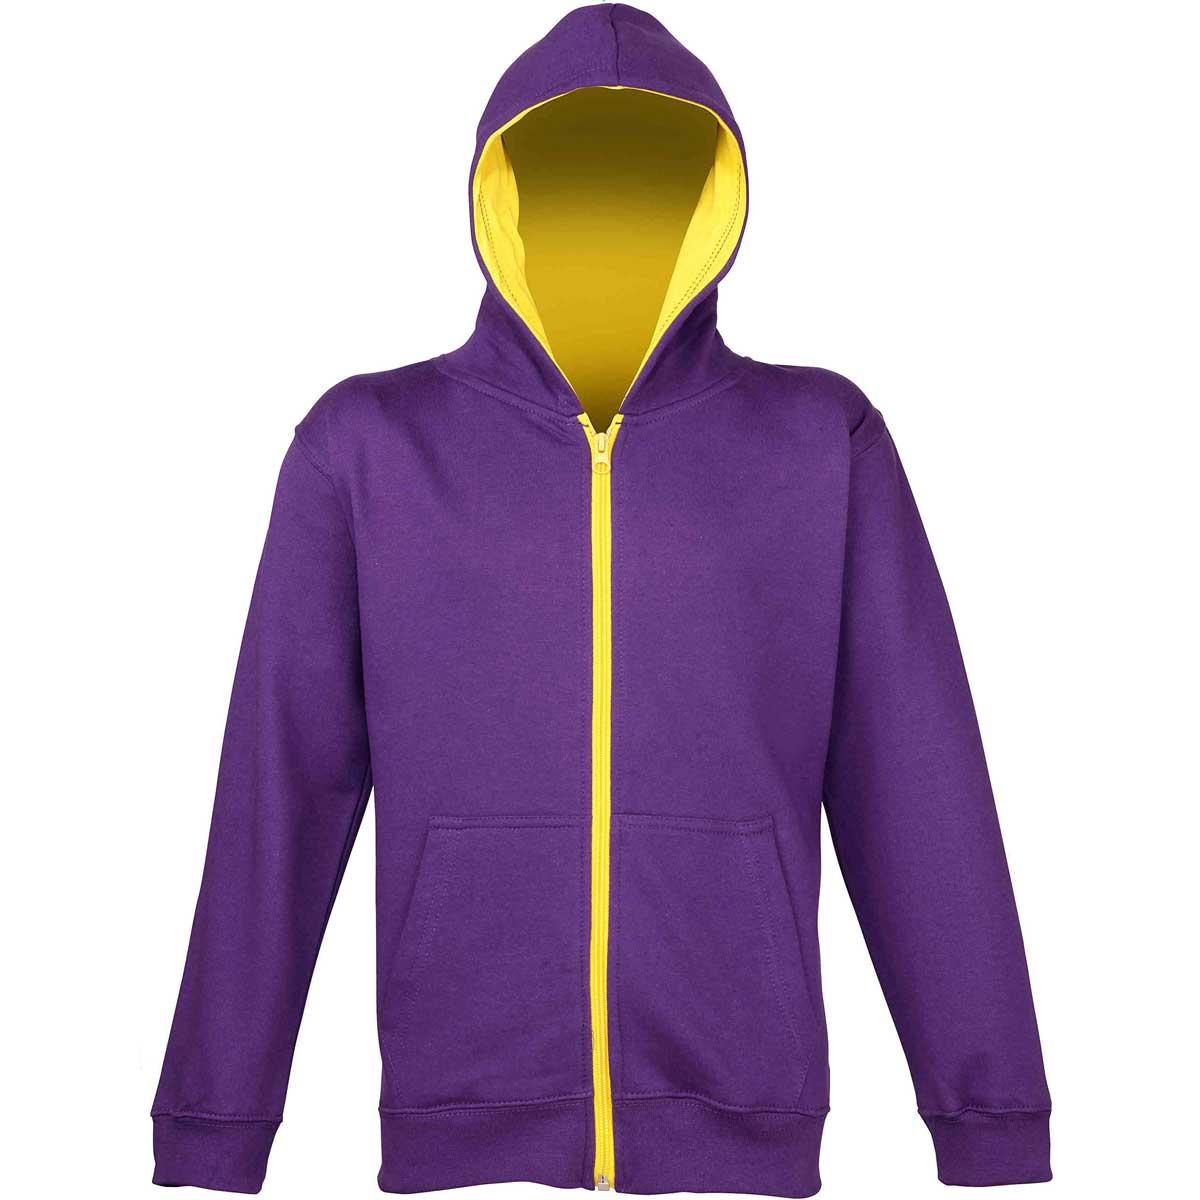 01_jh53j_2_violet_jaune--0-0--df048ac2-5378-46bf-88c2-6491b10d9d92